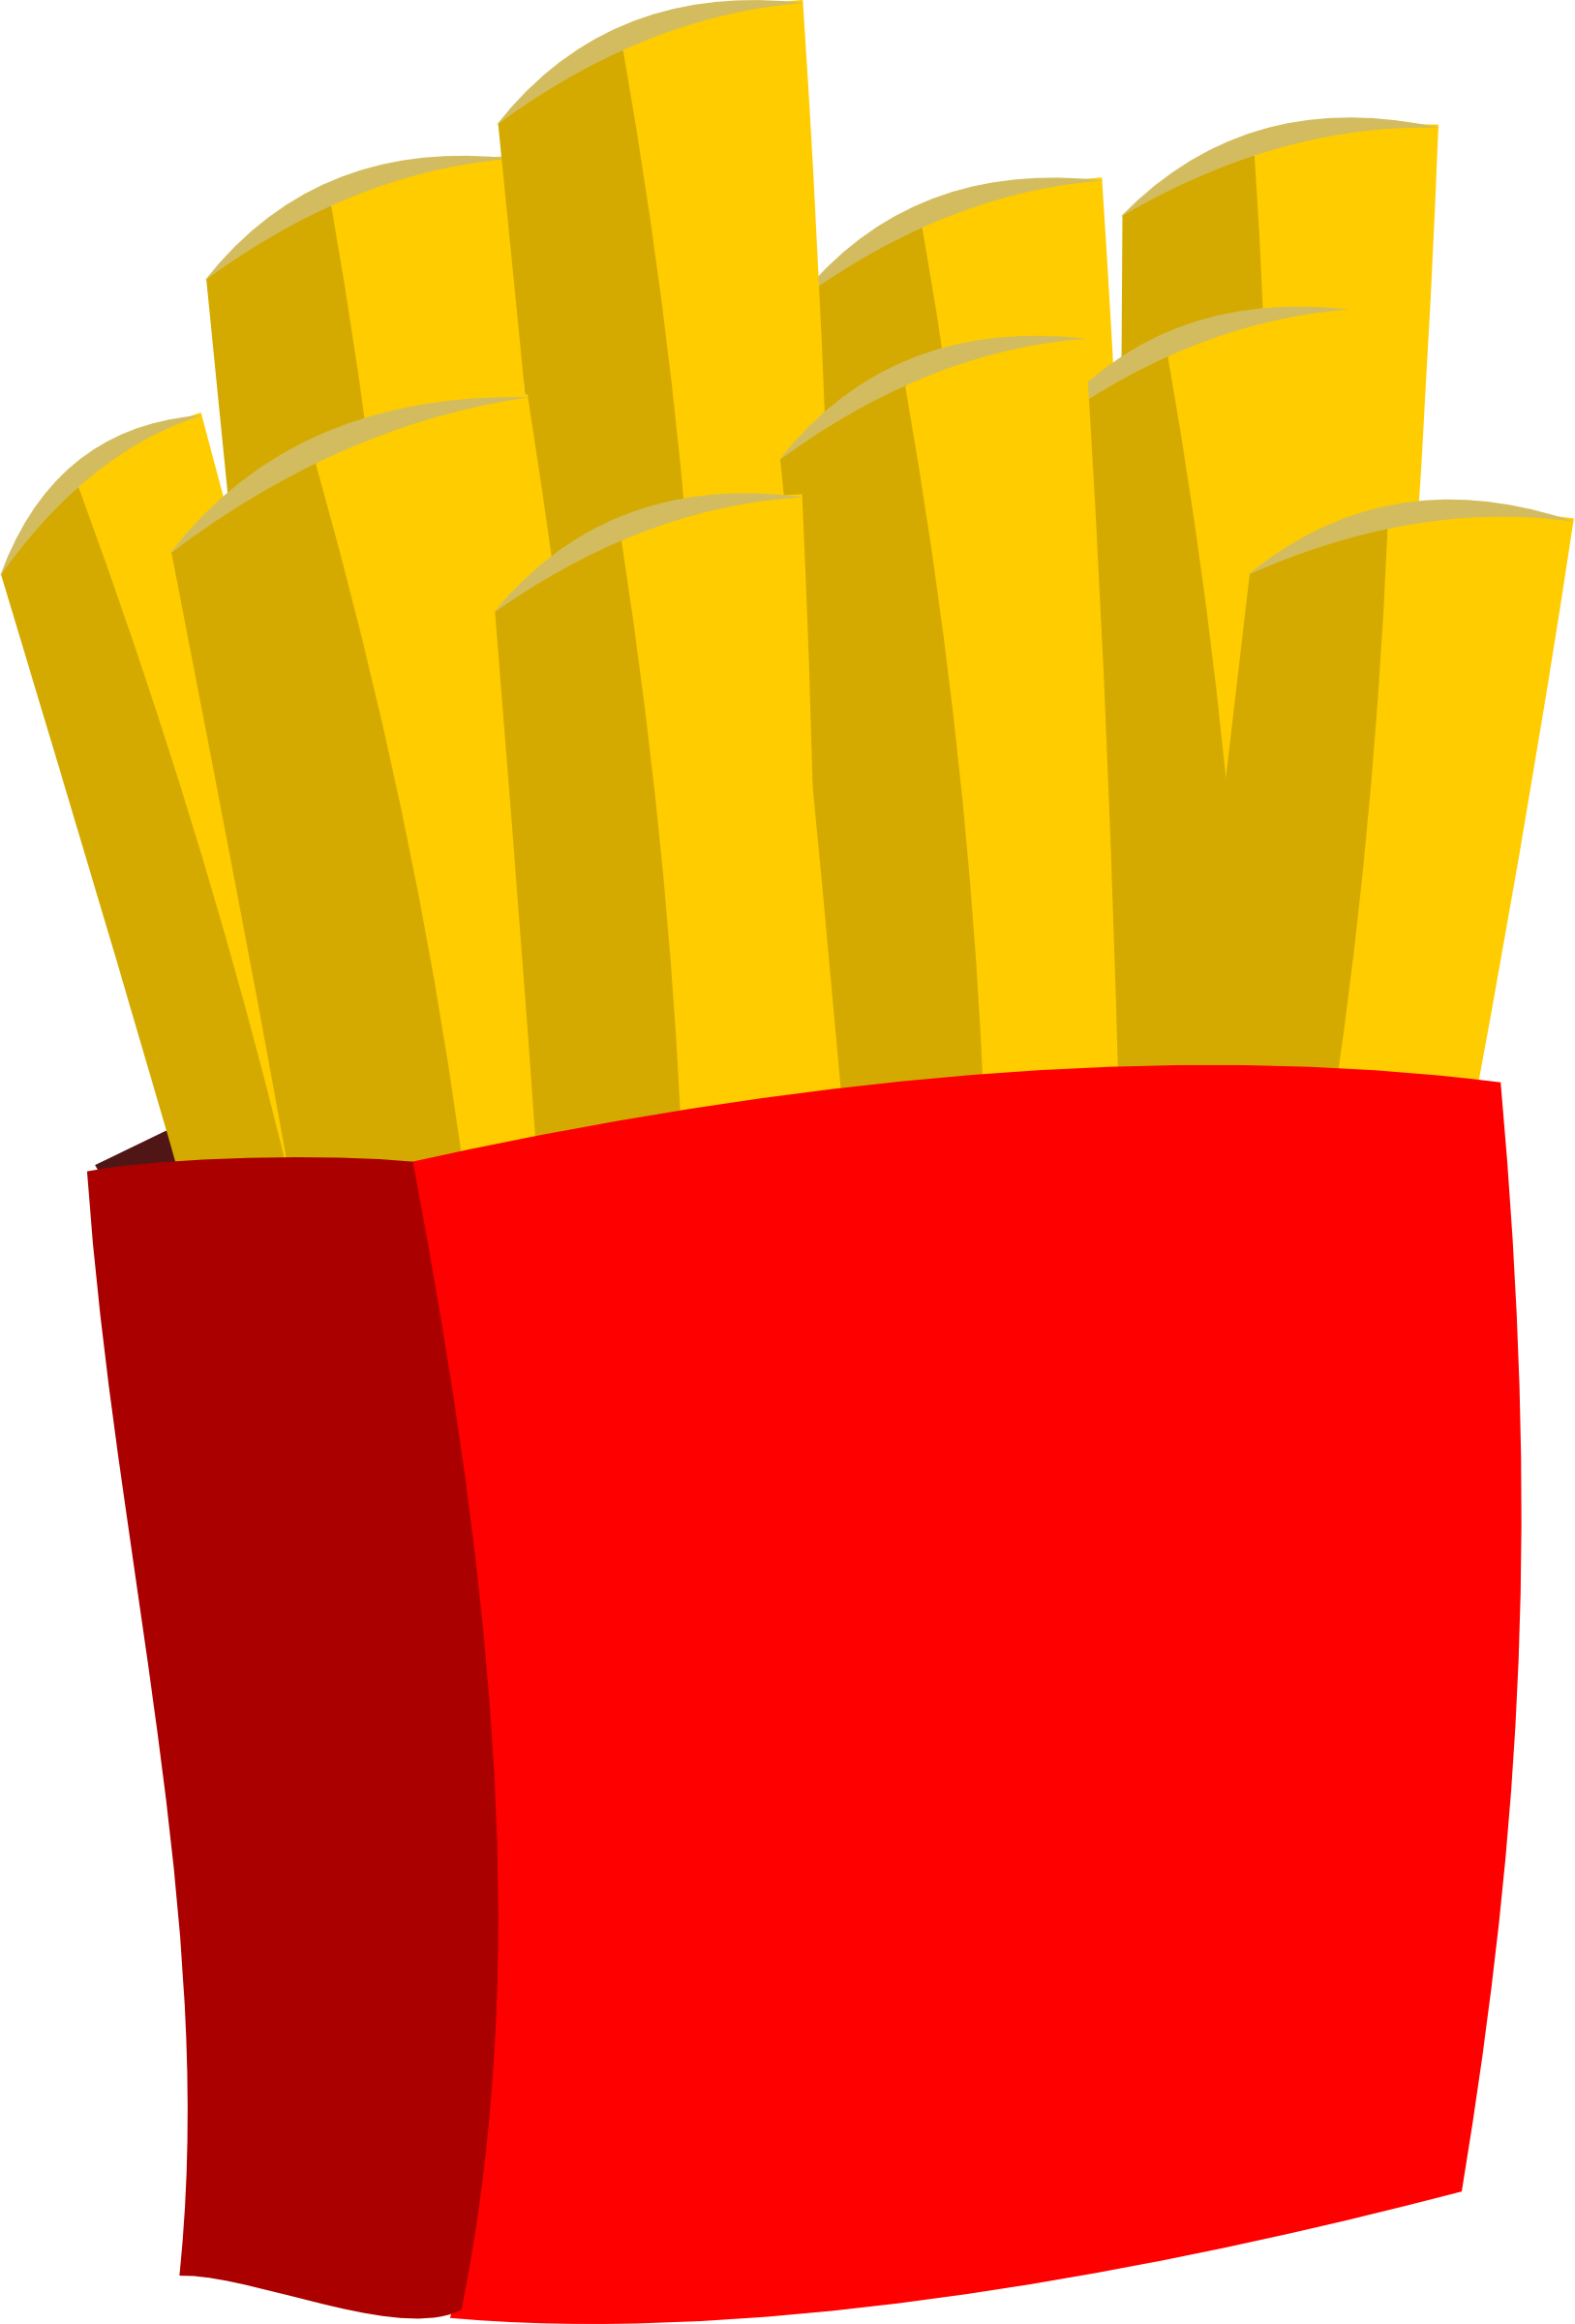 Fries clipart cute. Doritos panda free images